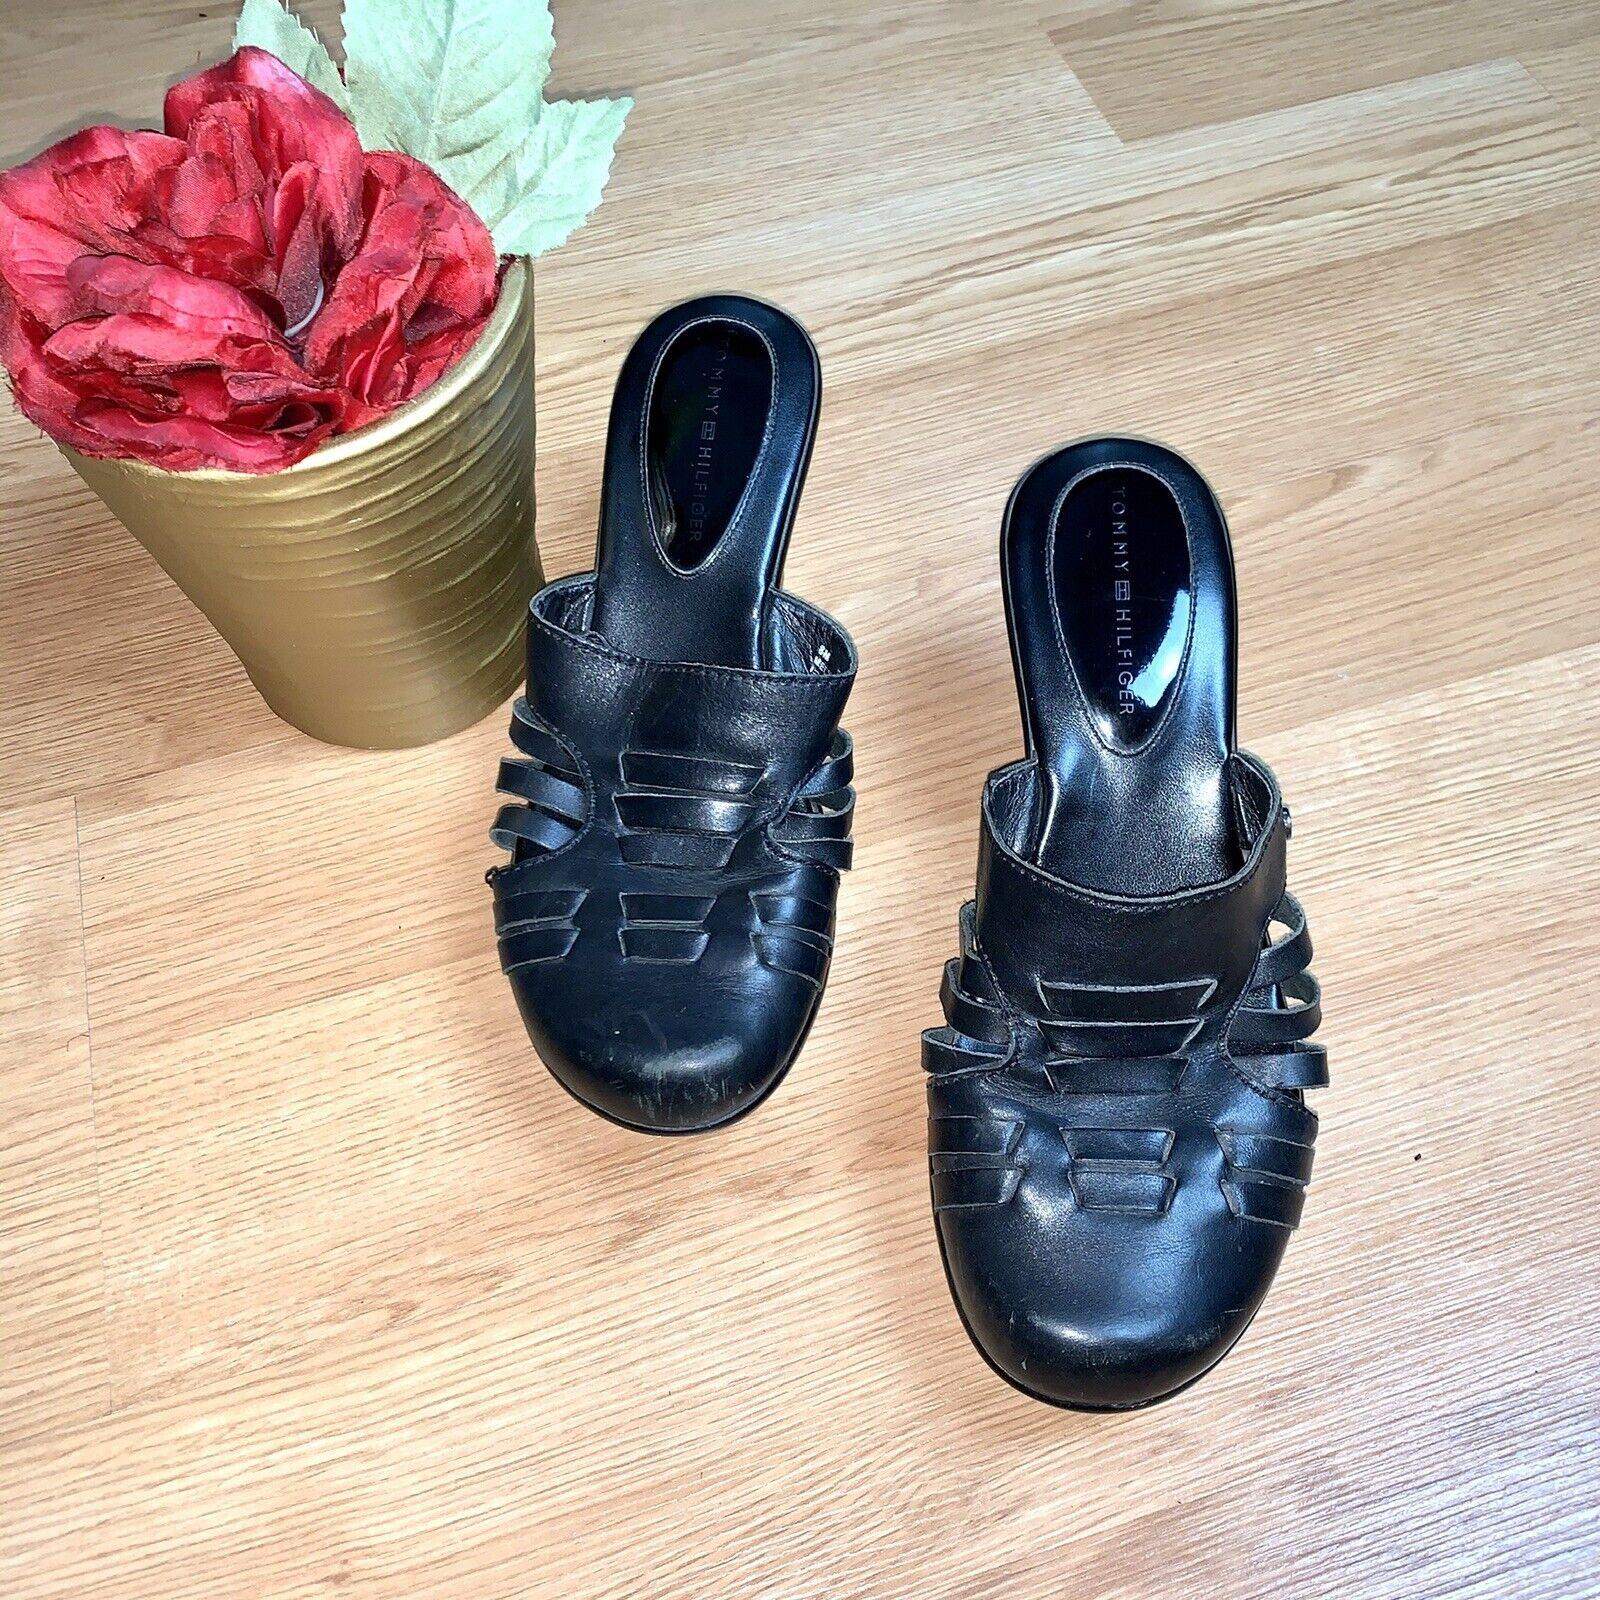 Tommy Hilfiger  Black Mule Leather Wedges Size 8 - image 4